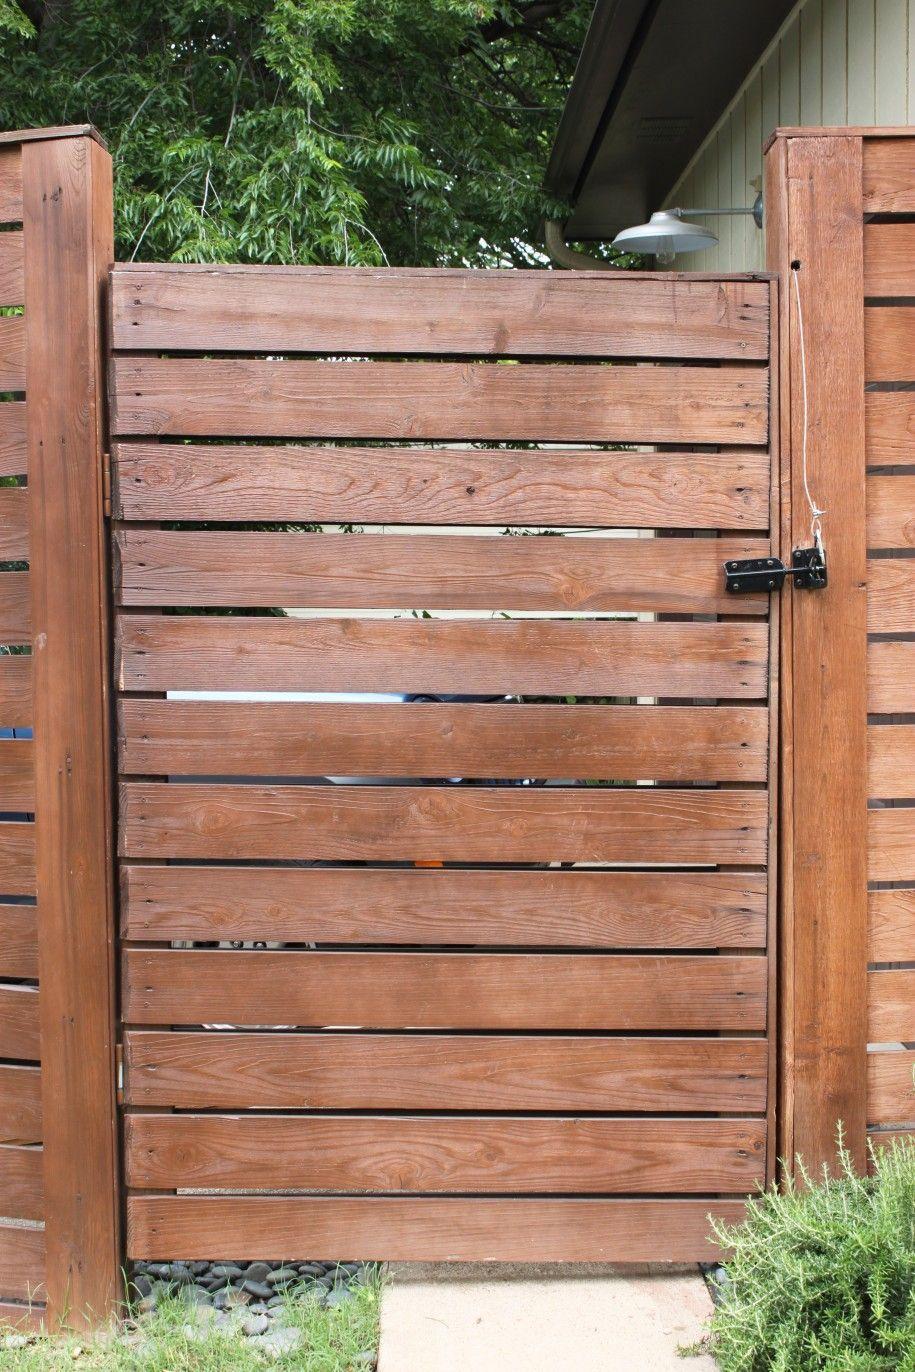 Exterior Modern Horizontal Fence Building Wooden Fence Gate How To Building Wooden Fence Gate As Your Am Building A Wooden Gate Wooden Fence Gate Wood Gate